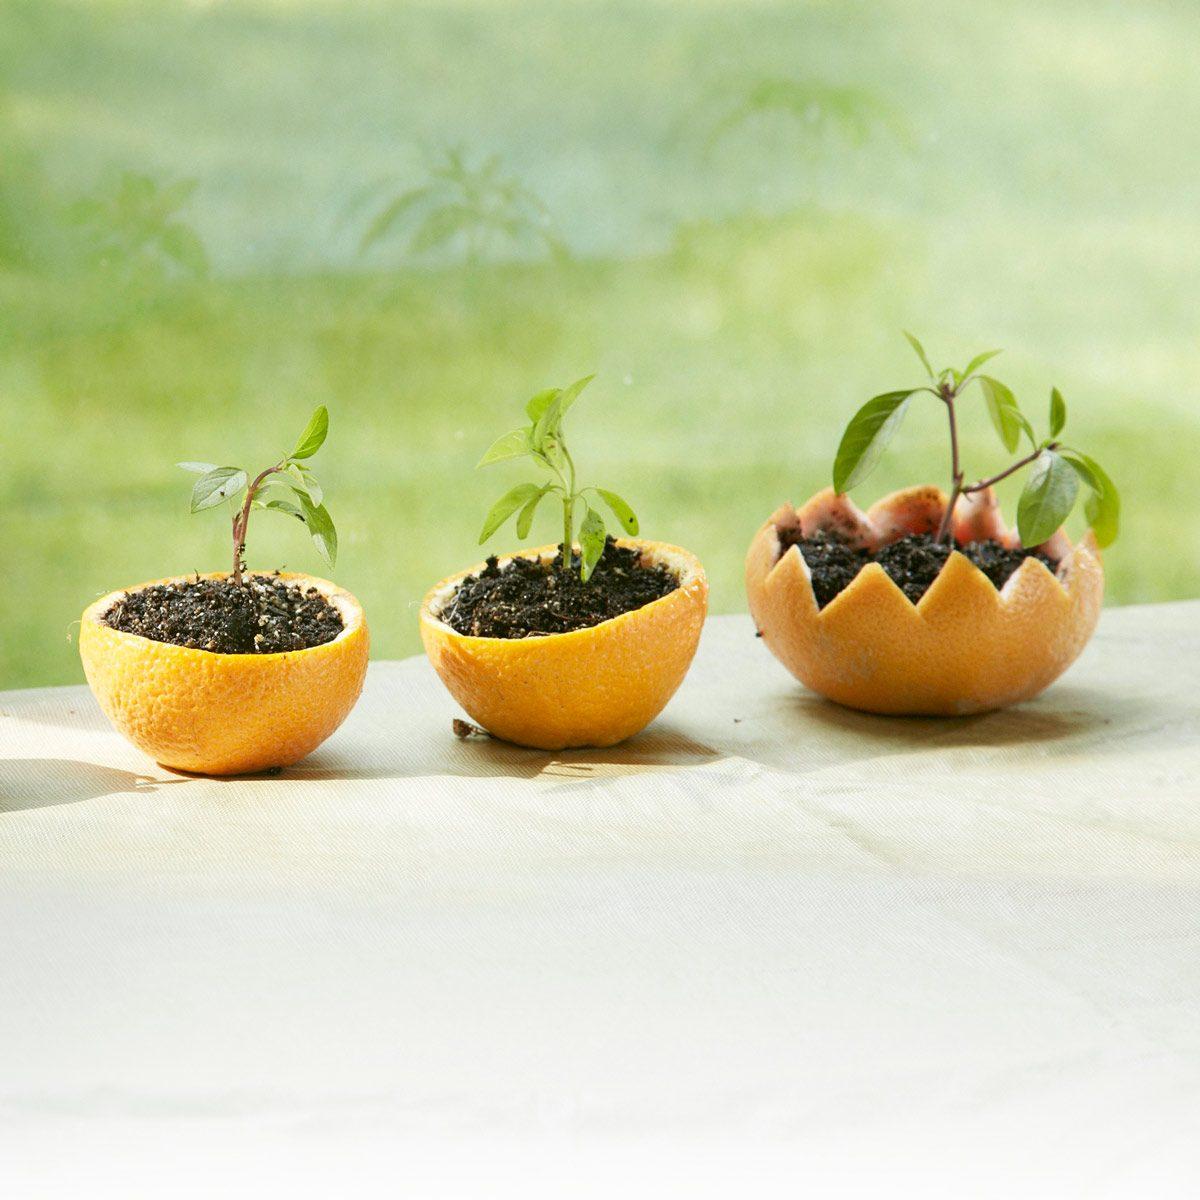 Citrus Rind Seed Starters